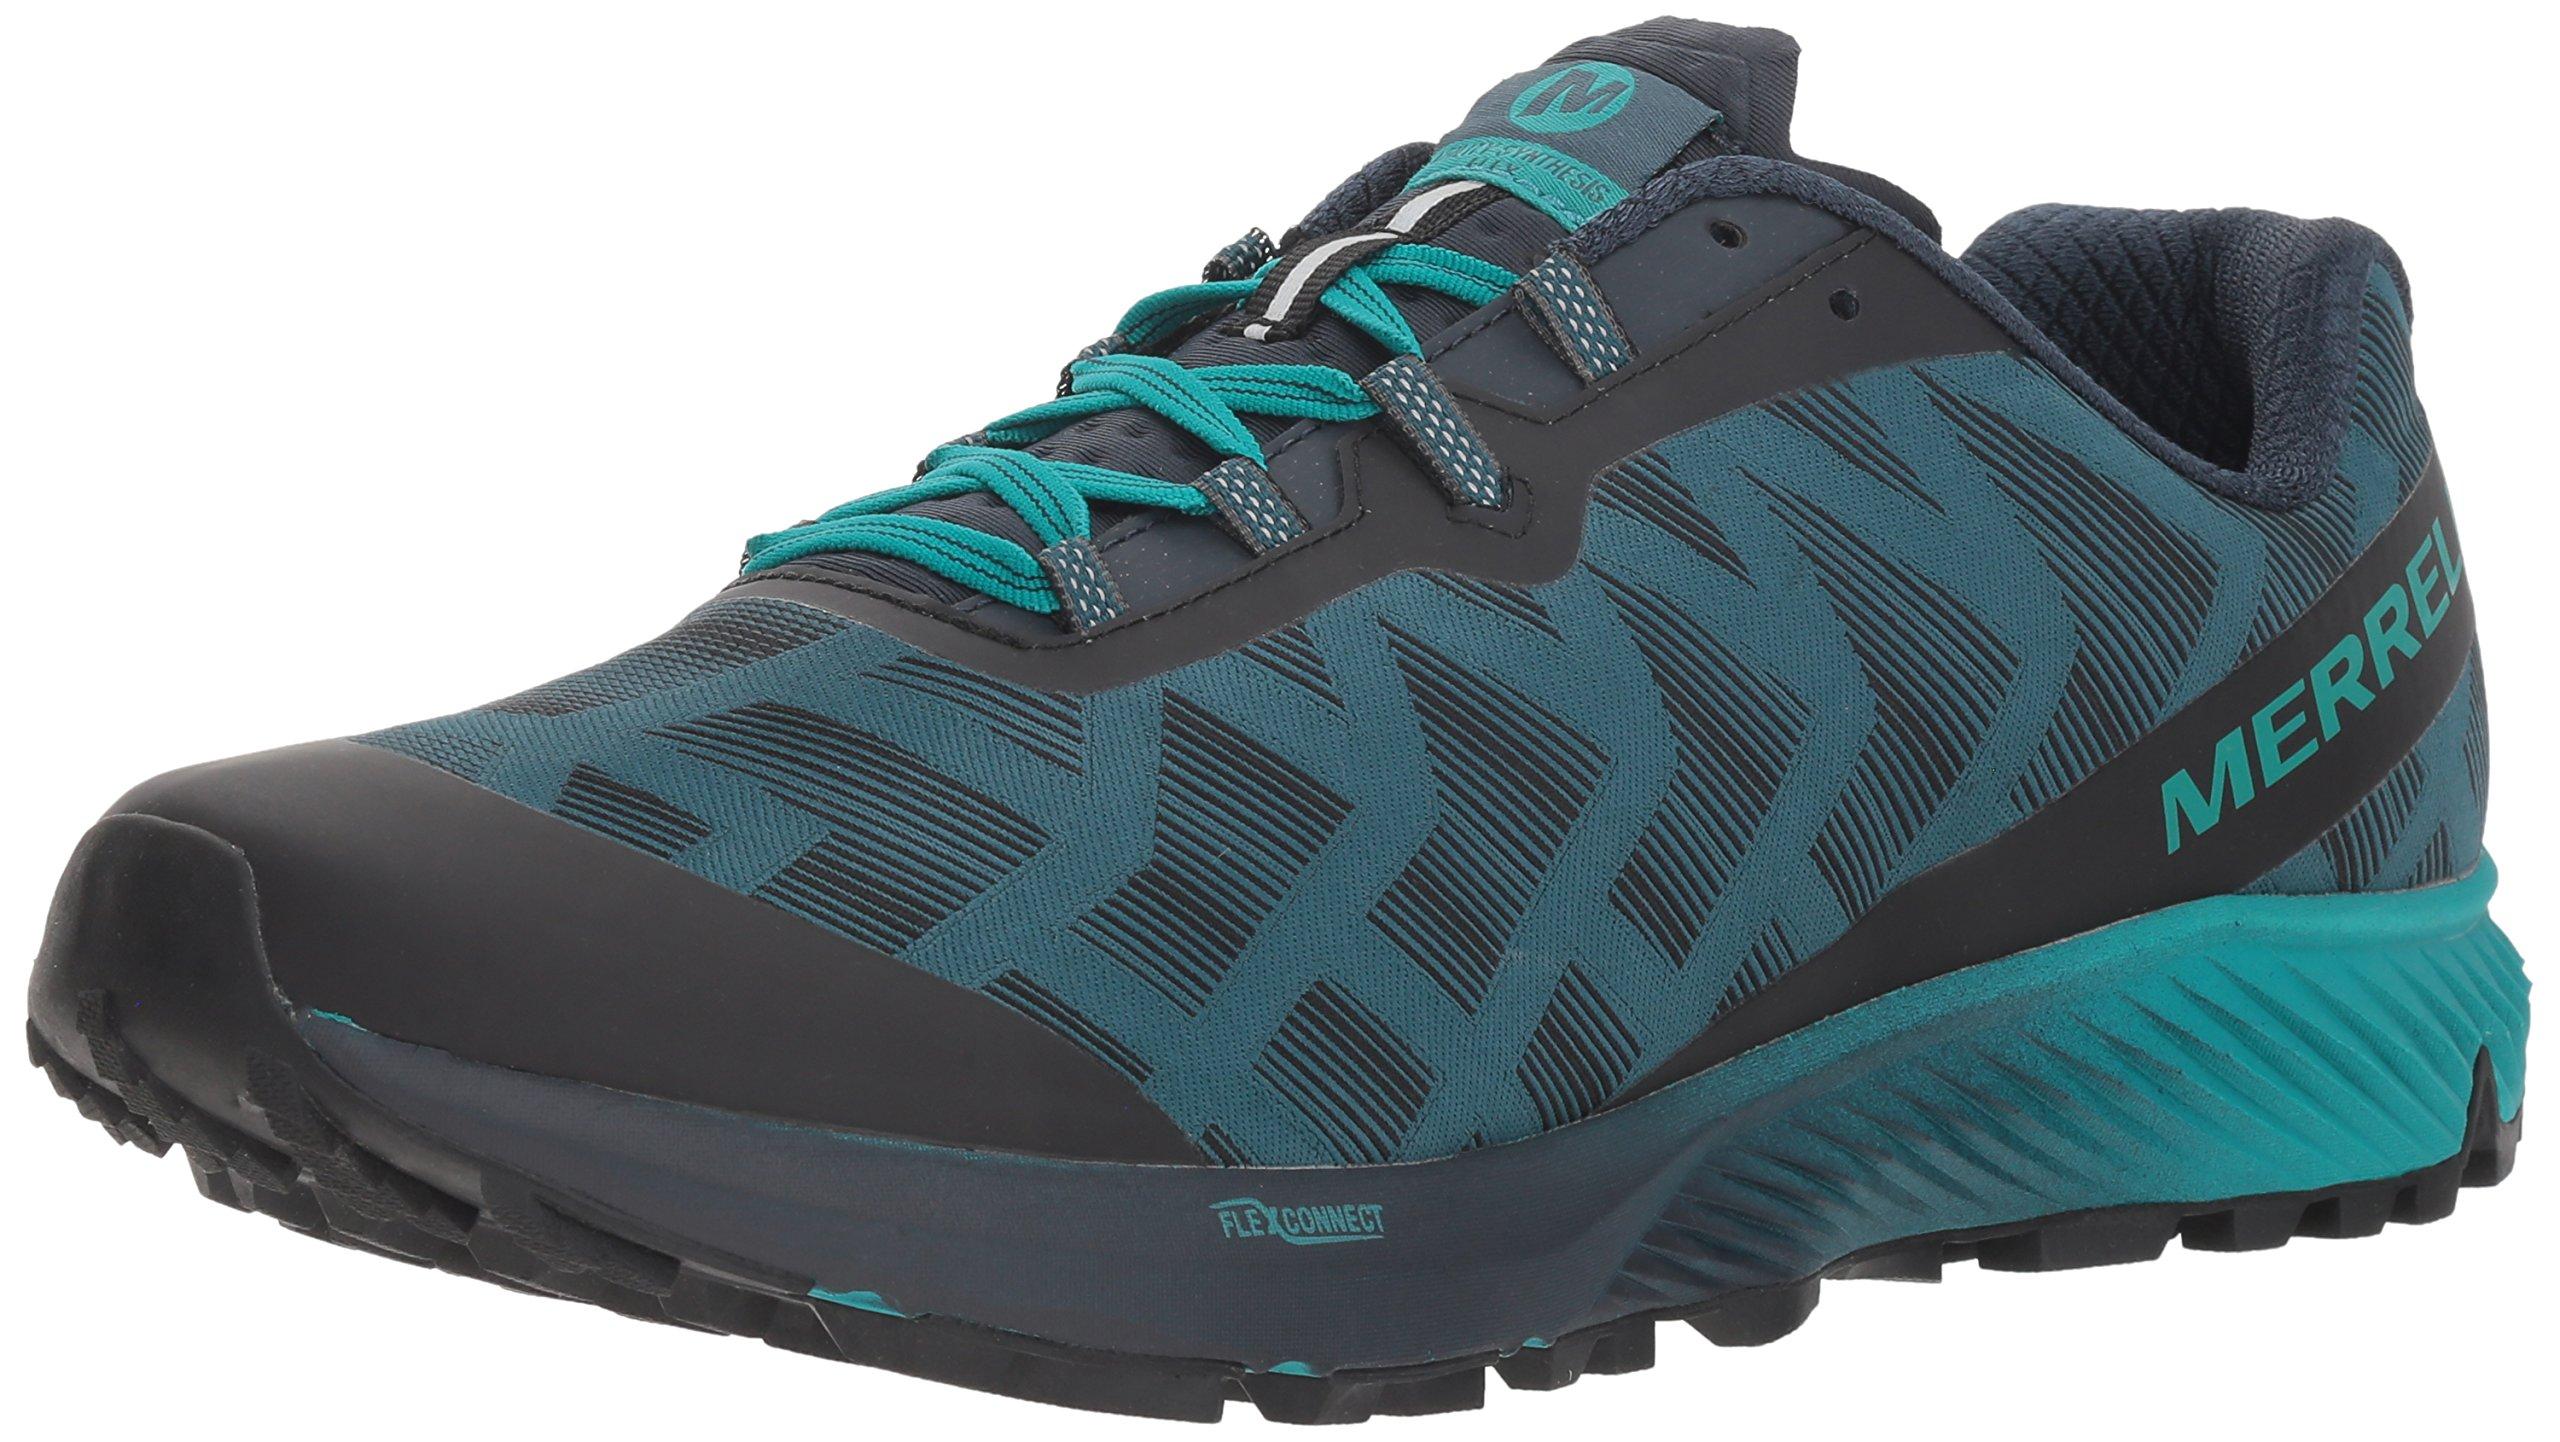 Merrell Men's Agility Synthesis Flex Sneaker, Cichlid, 9.5 M US